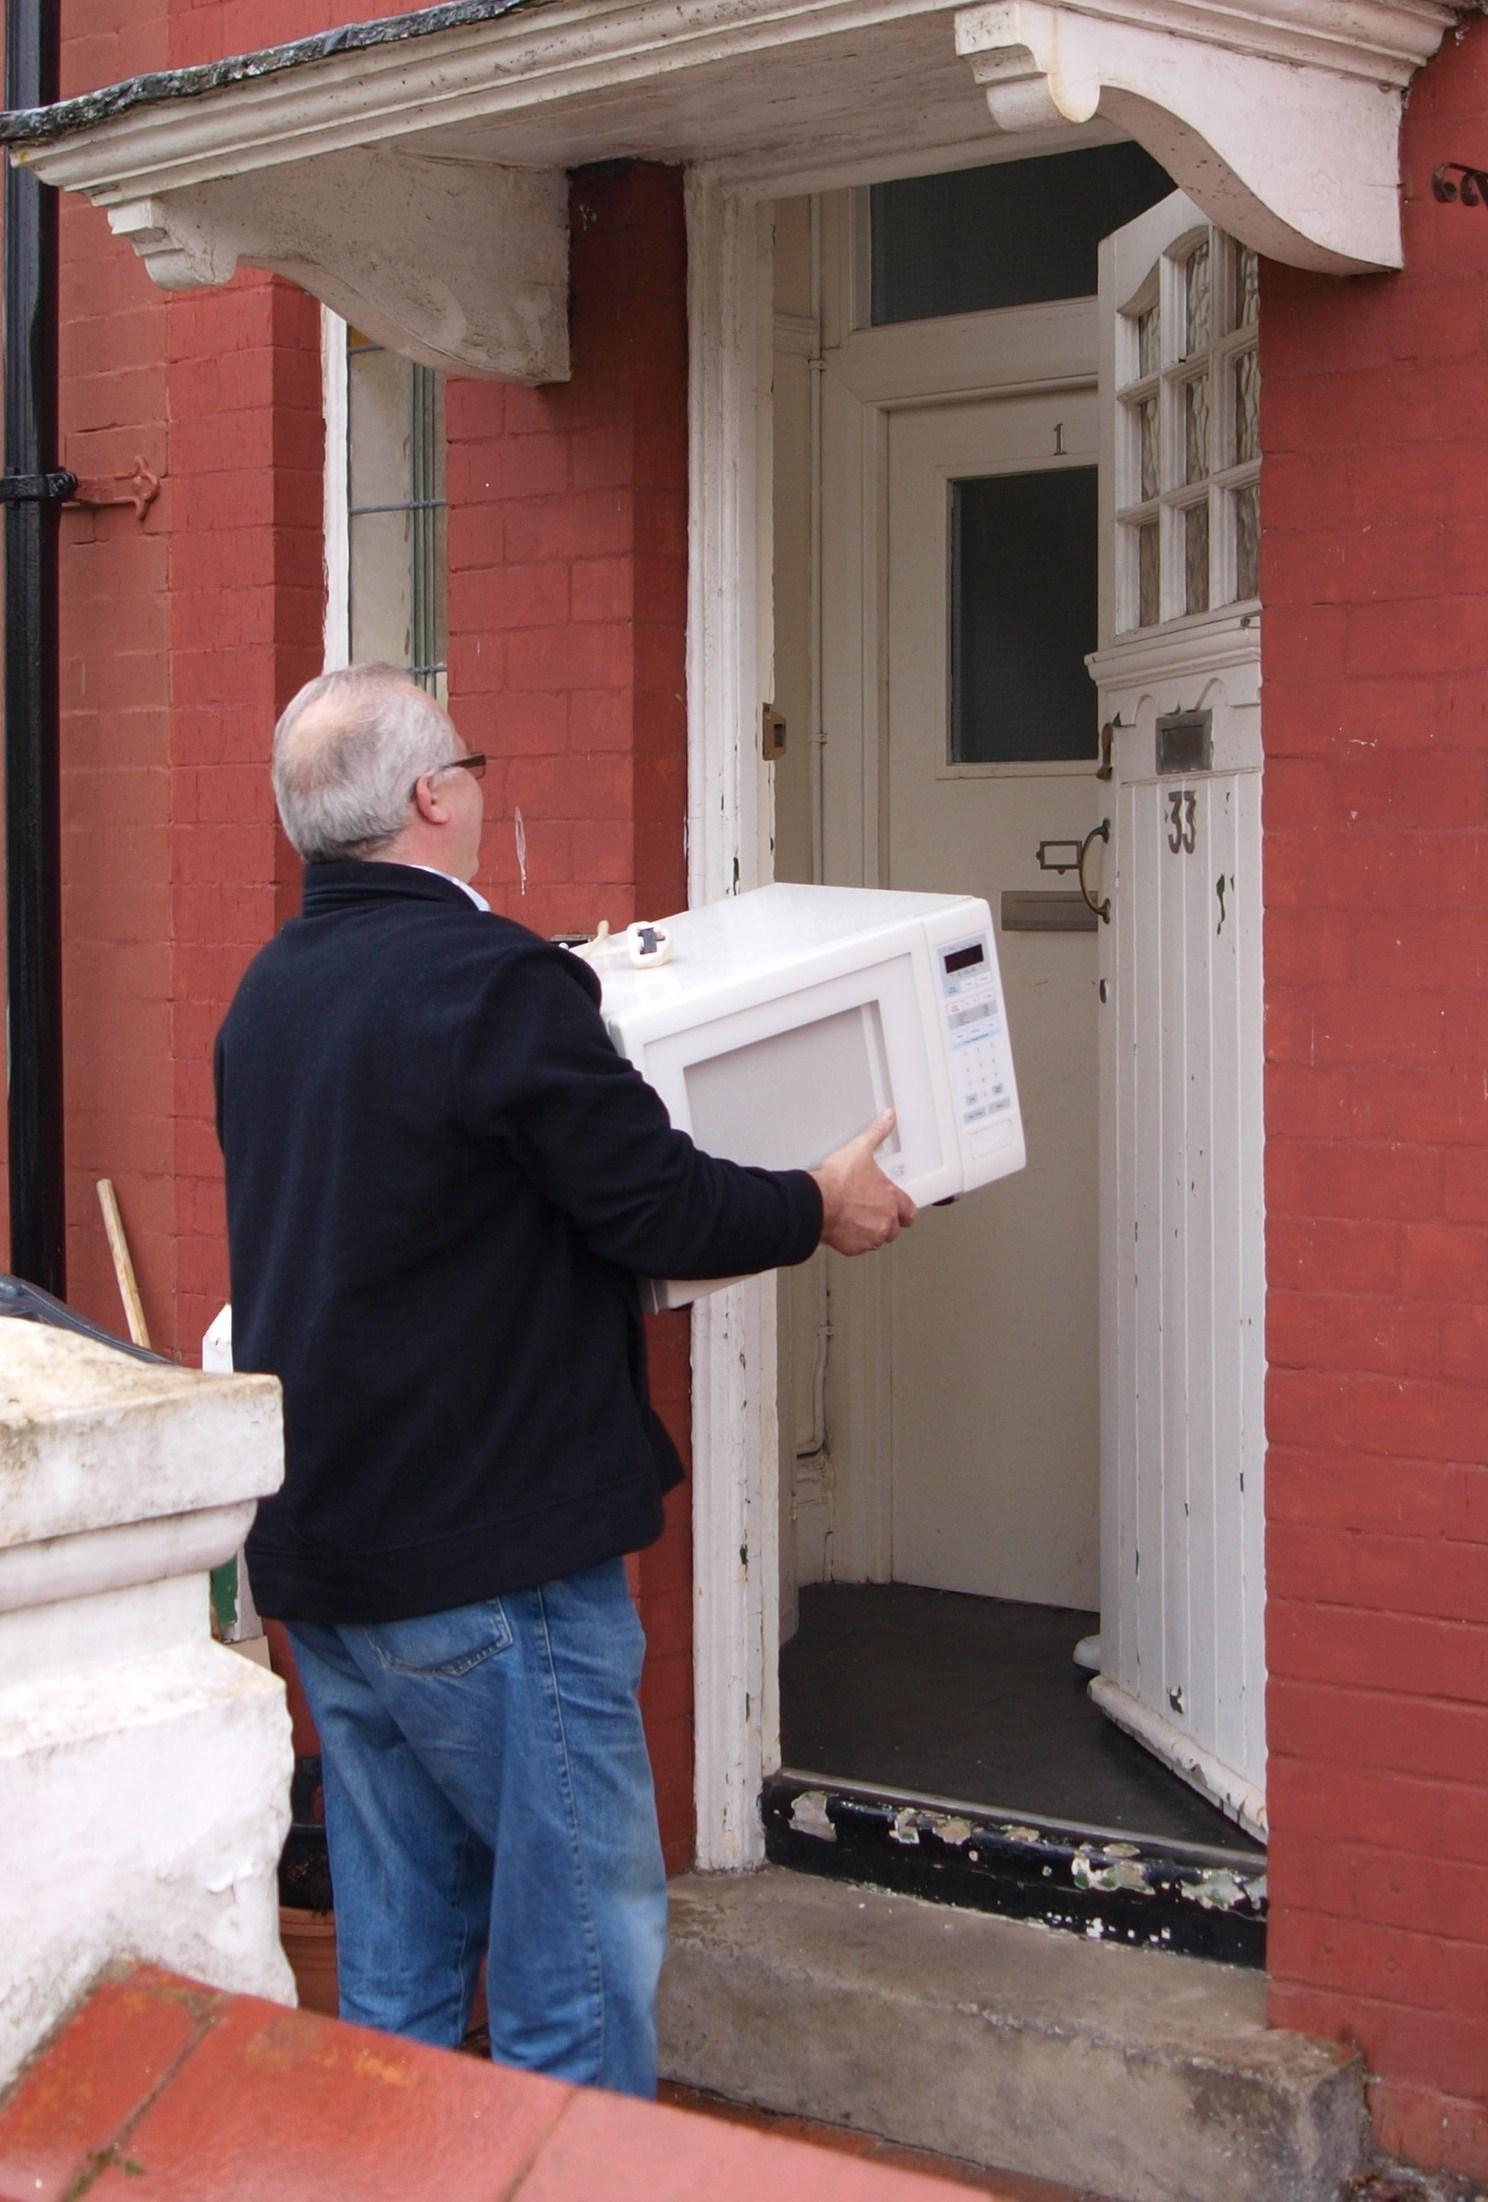 Delivering white goods